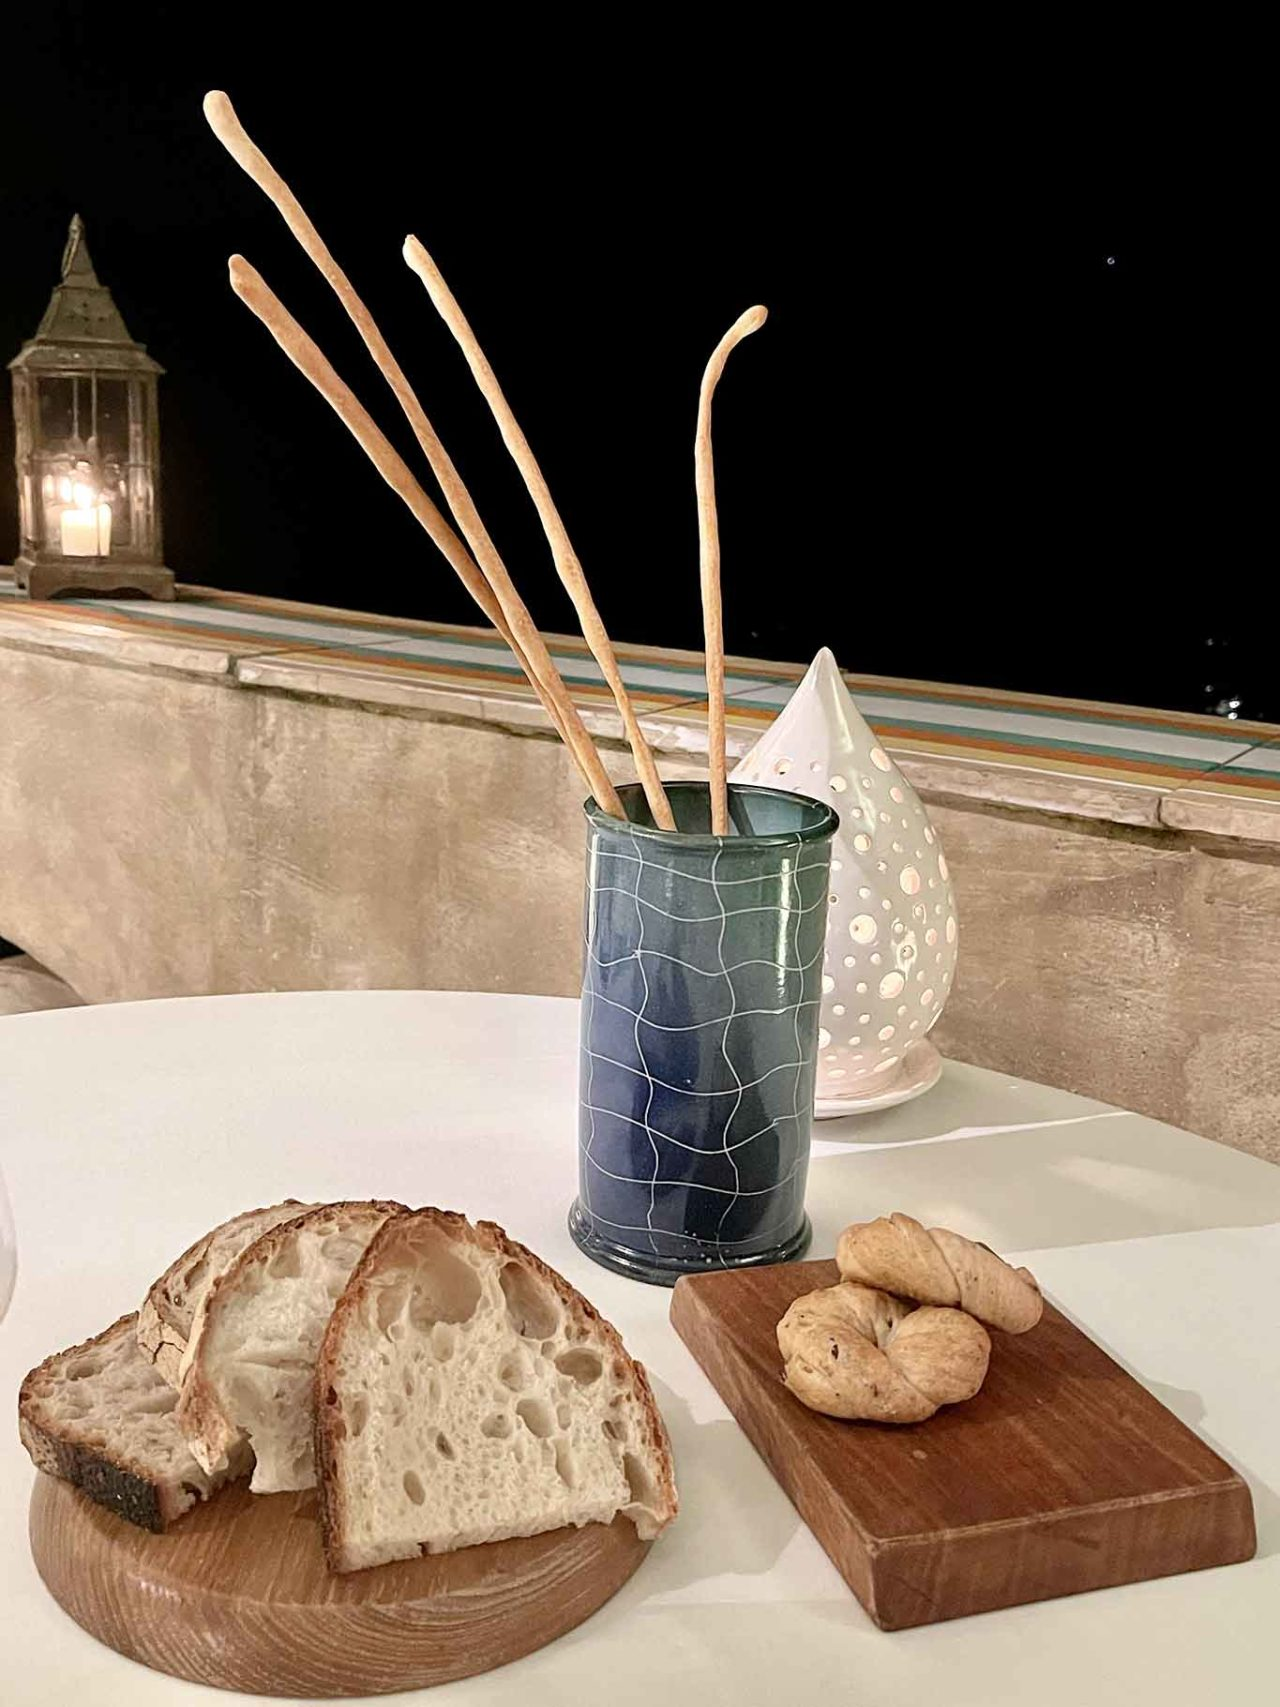 Flauto di Pan ristorante Ravello: pane